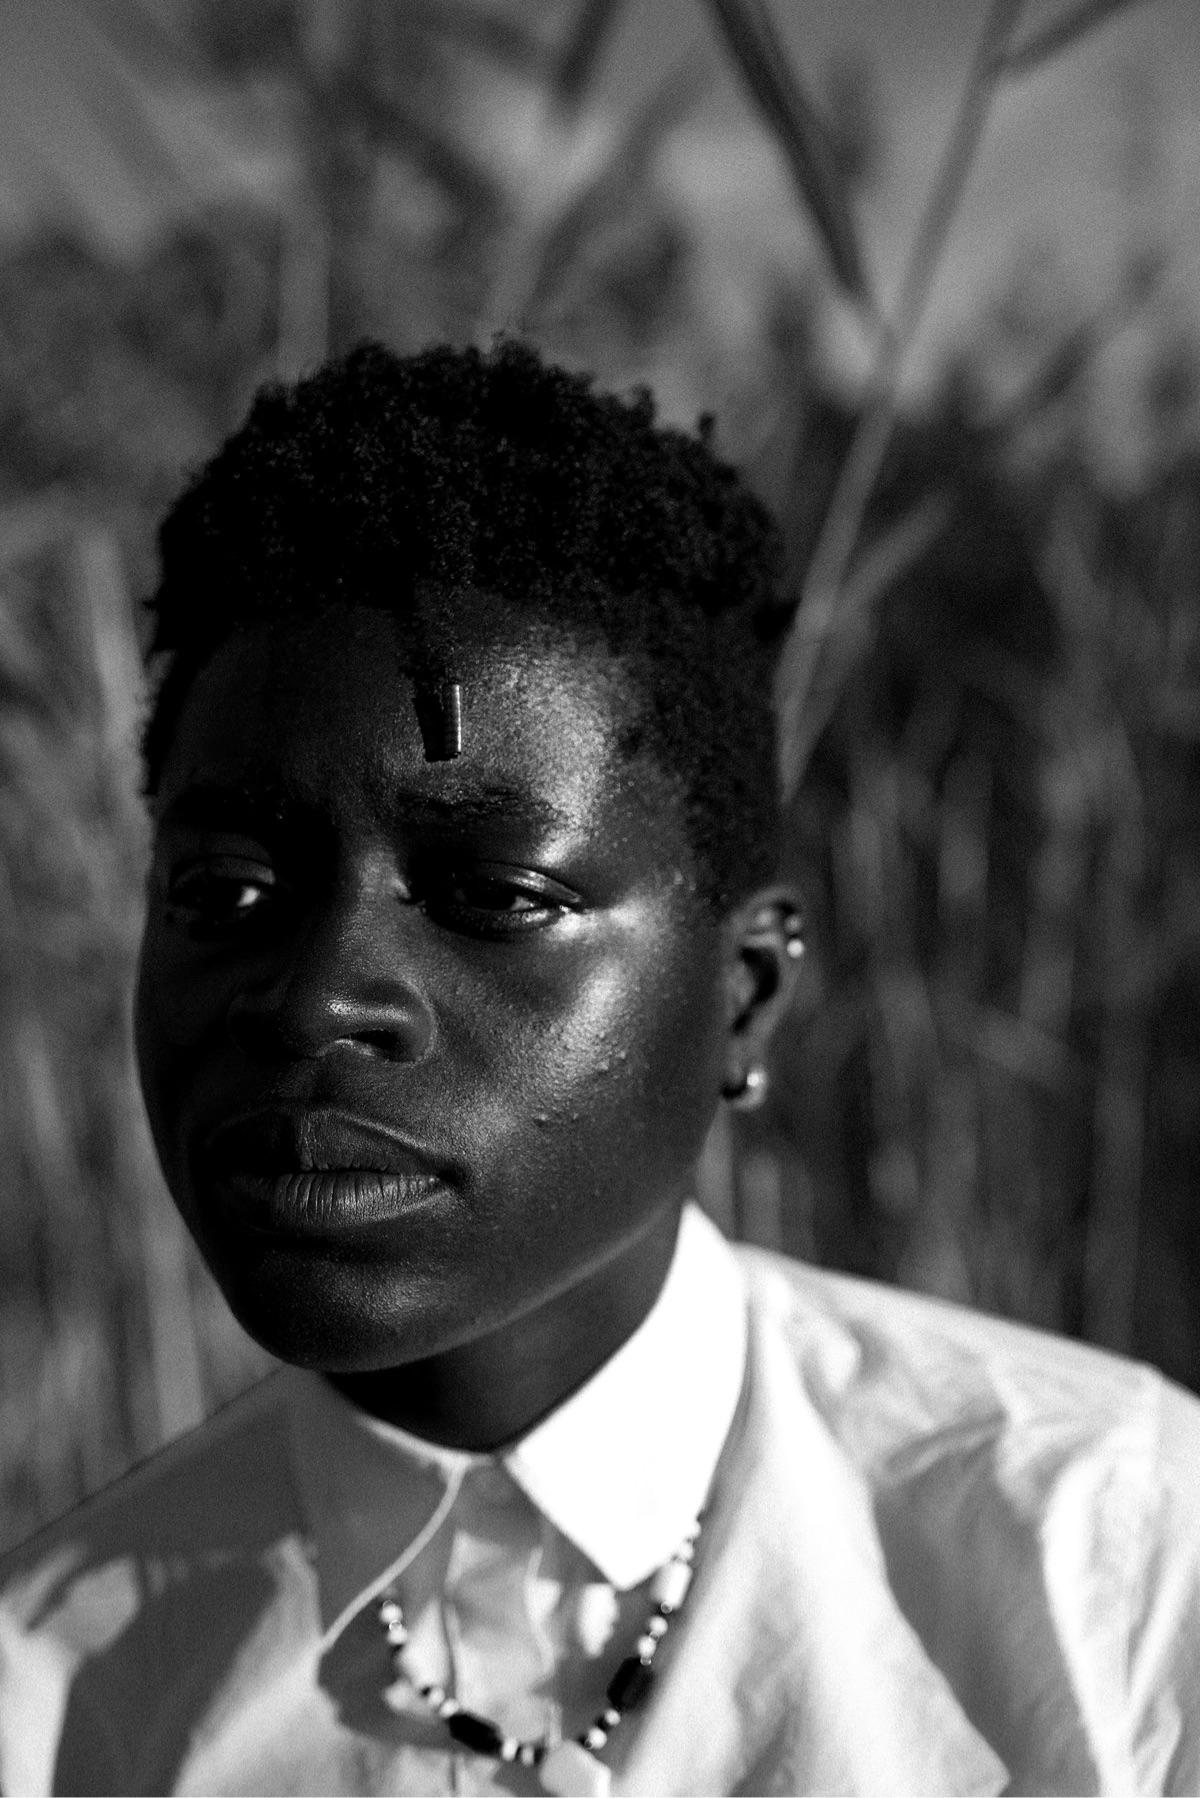 blackandwhite, portrait, photography - maggienovak   ello